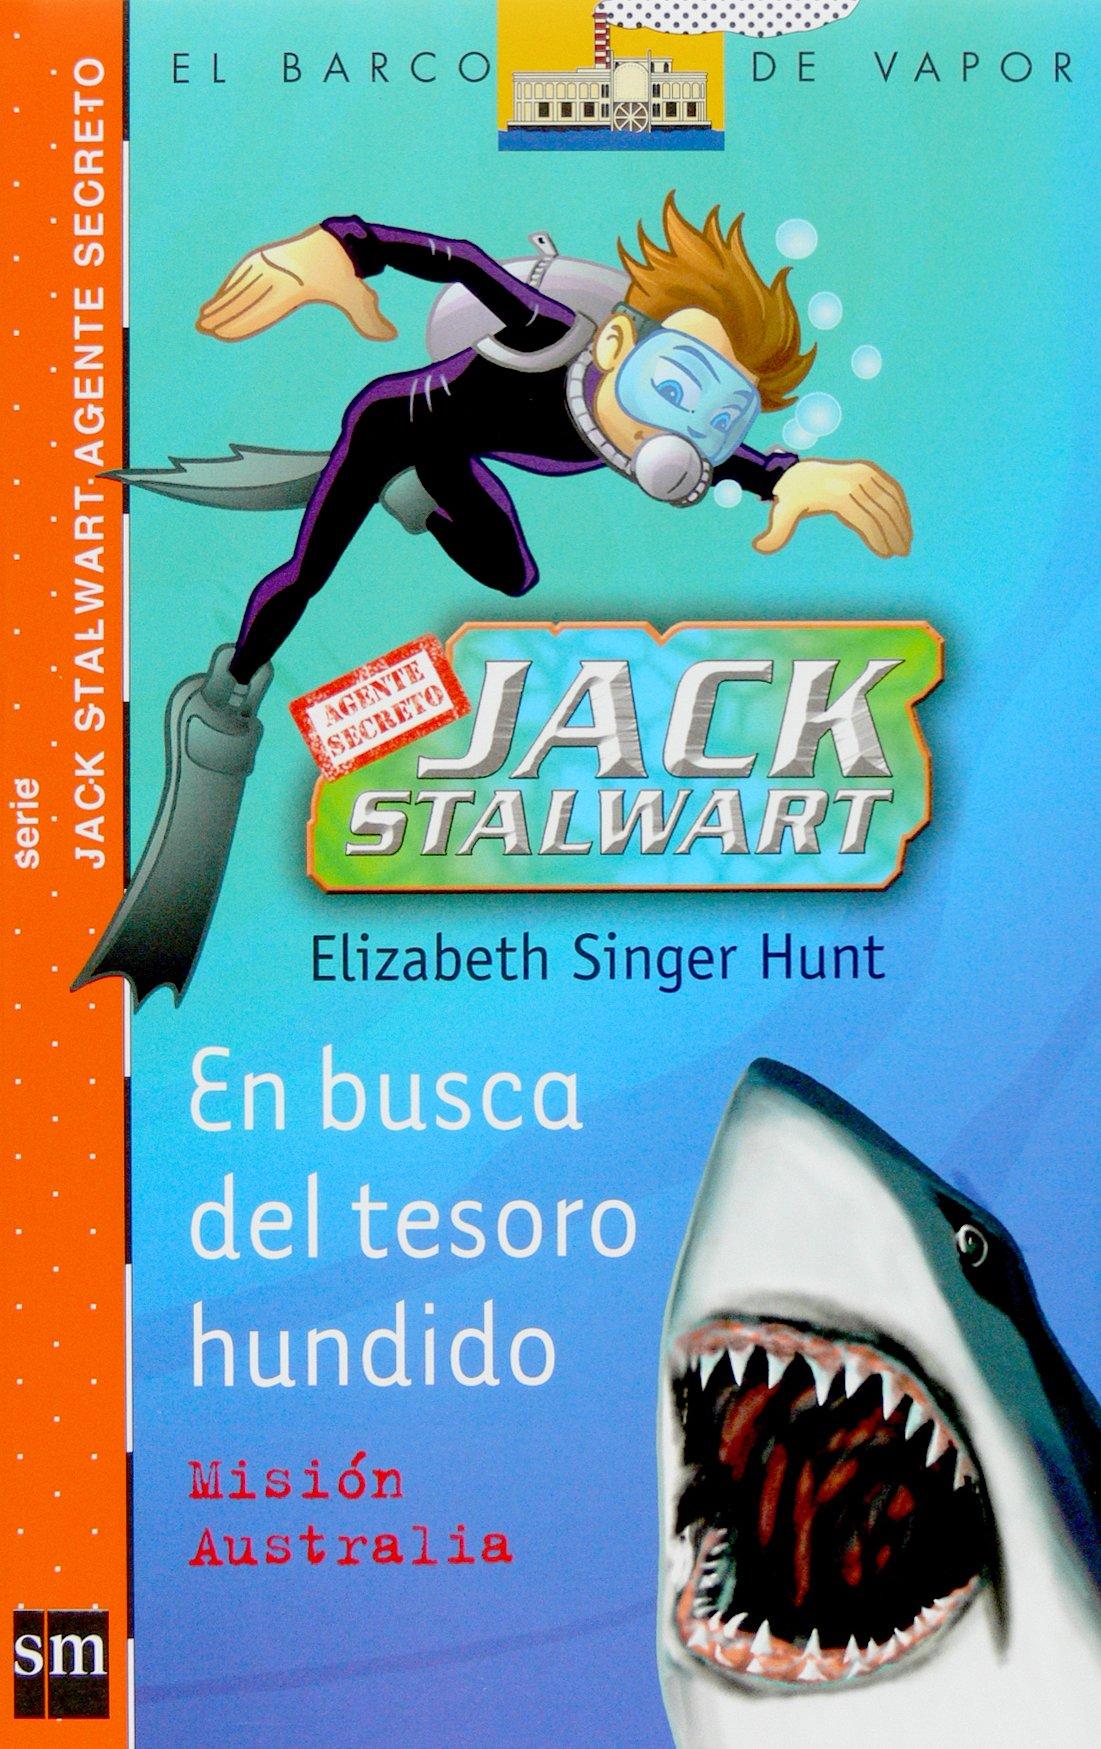 Download En busca del tesoro hundido/ The Search For the Sunken Treasure: Mission Australia/ Australia (El Barco De Vapor: Jack Stalwart Agente Secreto/ The ... Secret Agent Jack Stalwart) (Spanish Edition) PDF